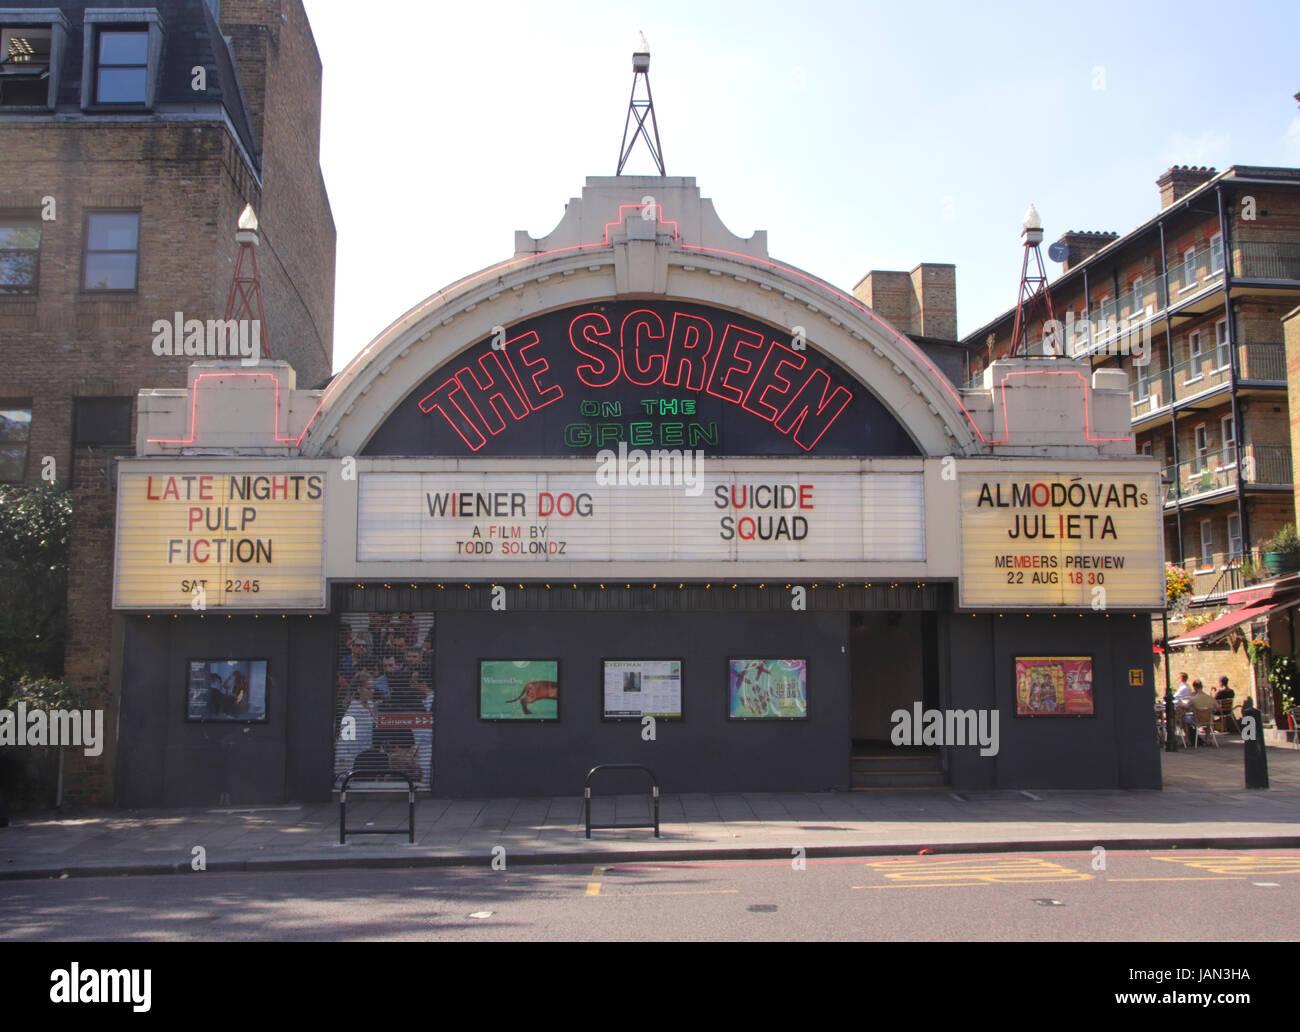 The Screen on the Green Cinema Upper Street Islington London Stock Photo